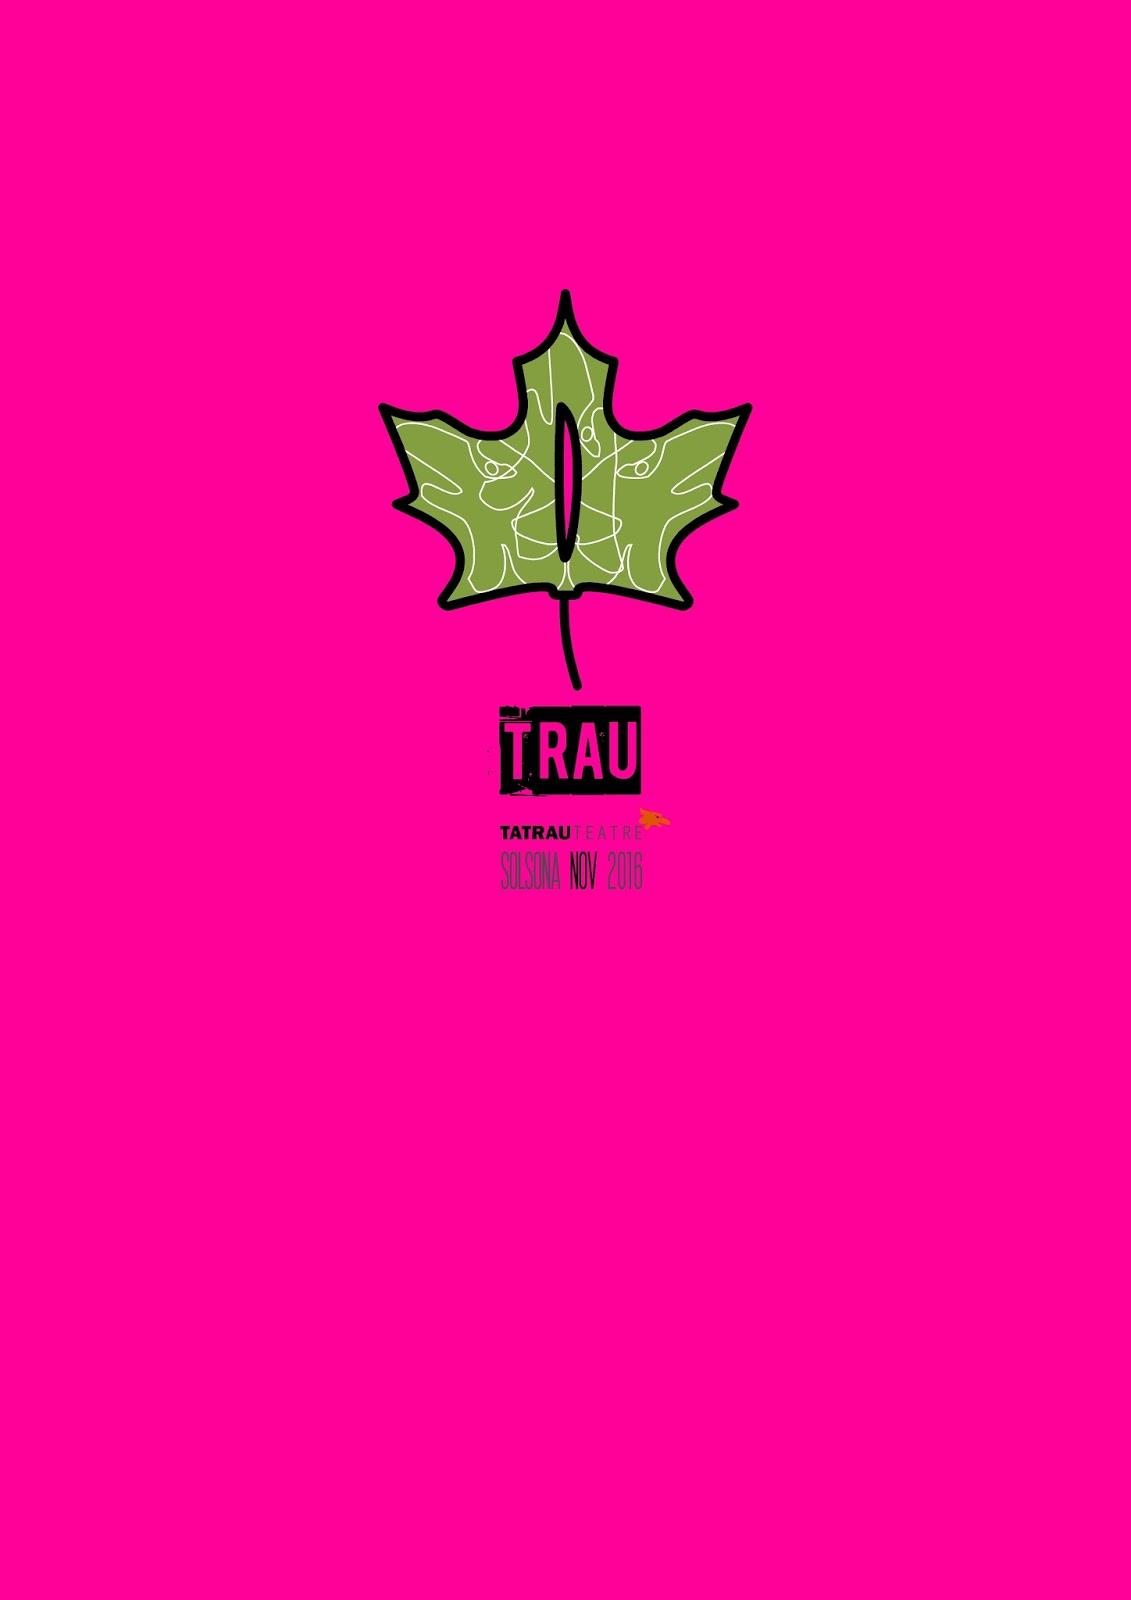 TRAU_2016